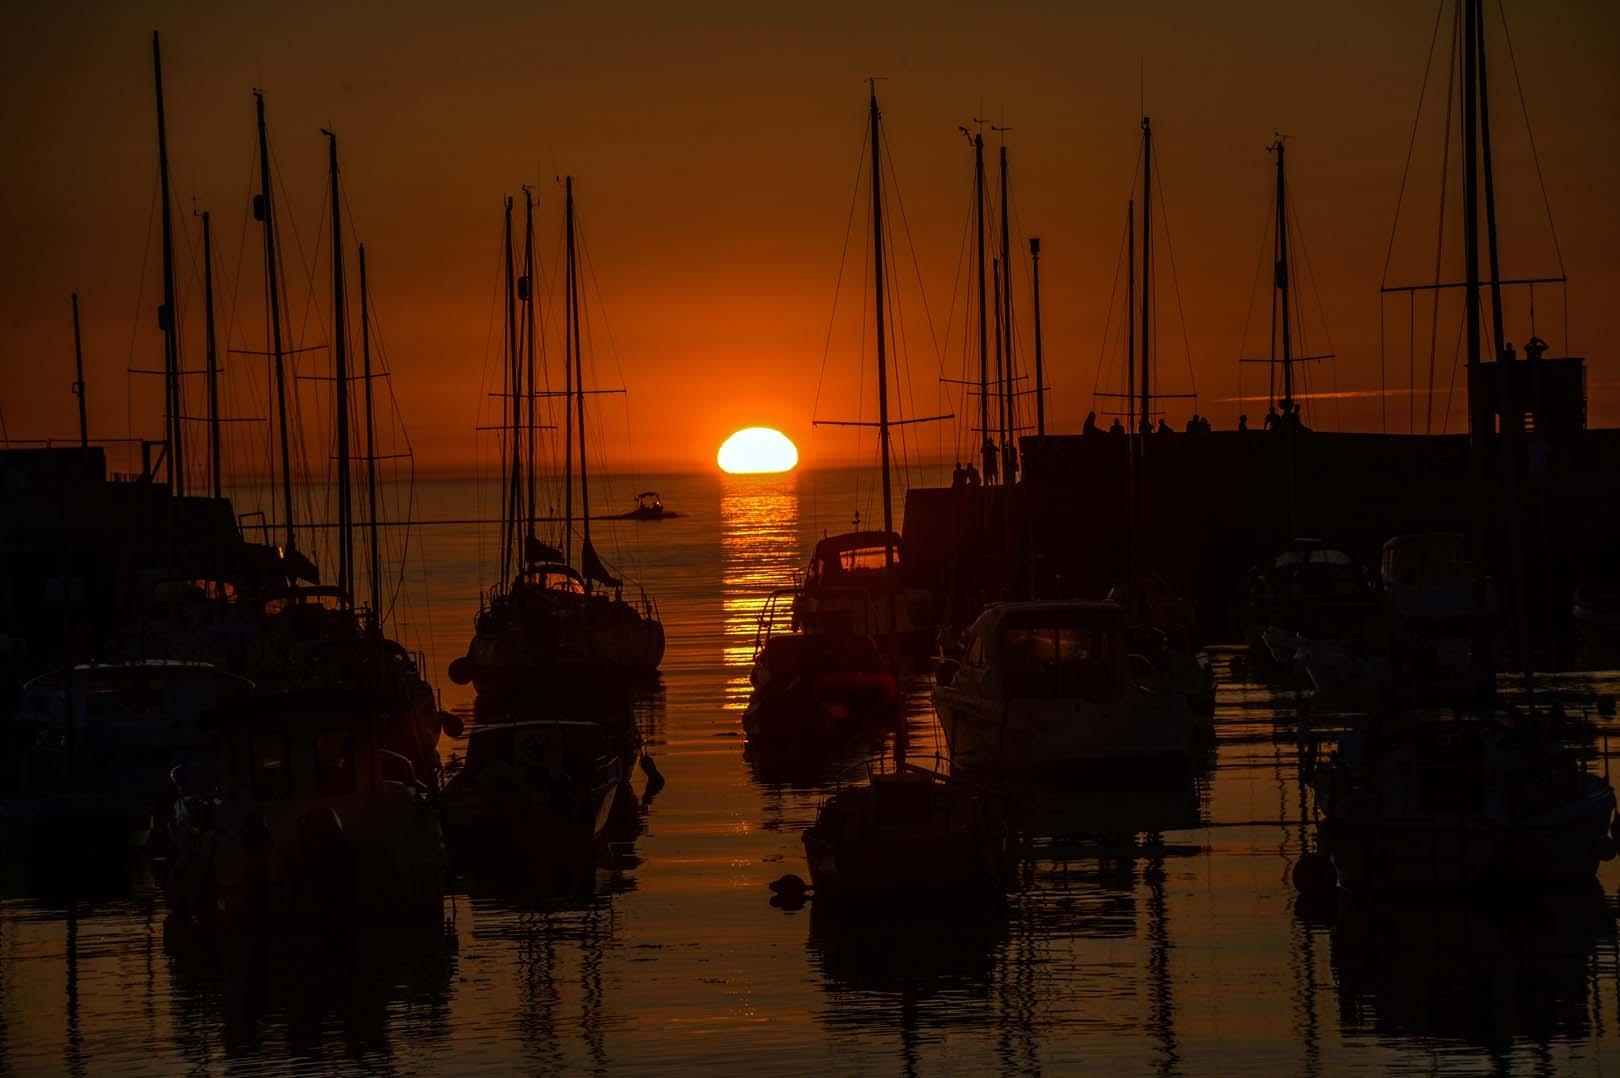 Sun set over the harbor Aberaeron West Wales by andychittockphotohrapher